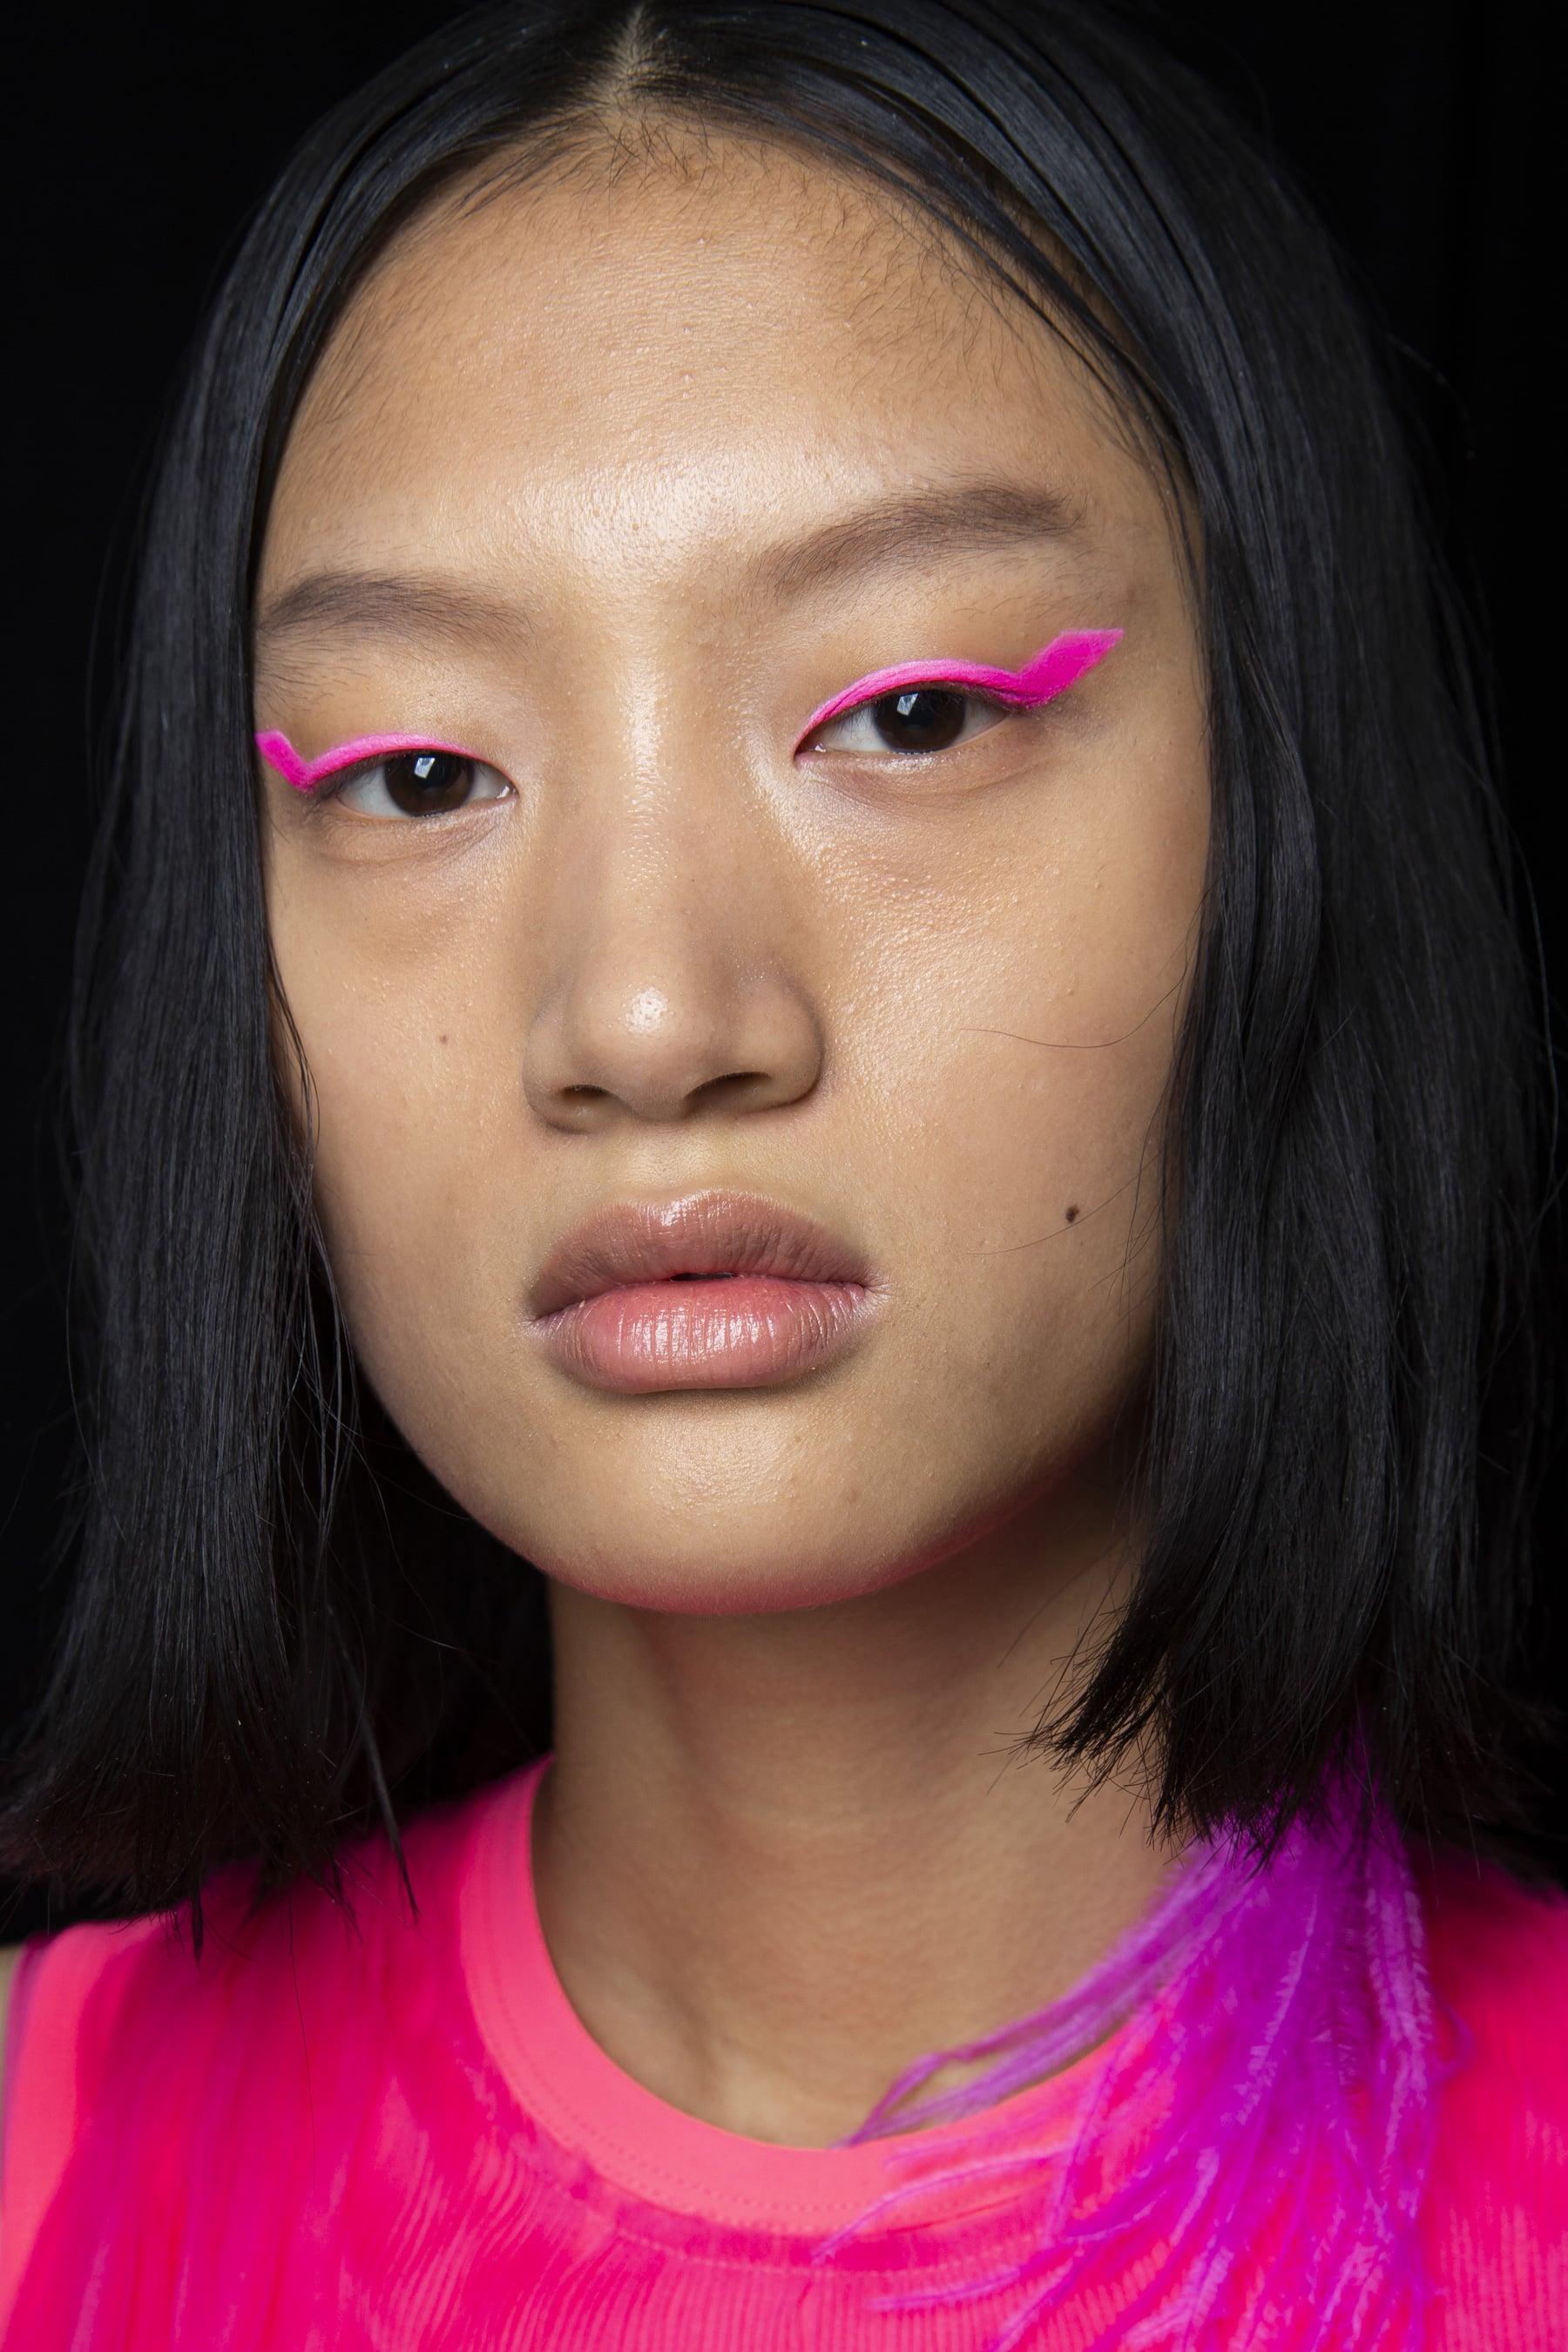 Beauty Trends 2020.Spring 2020 Runway Beauty Trends Shocks Of Neon The Best